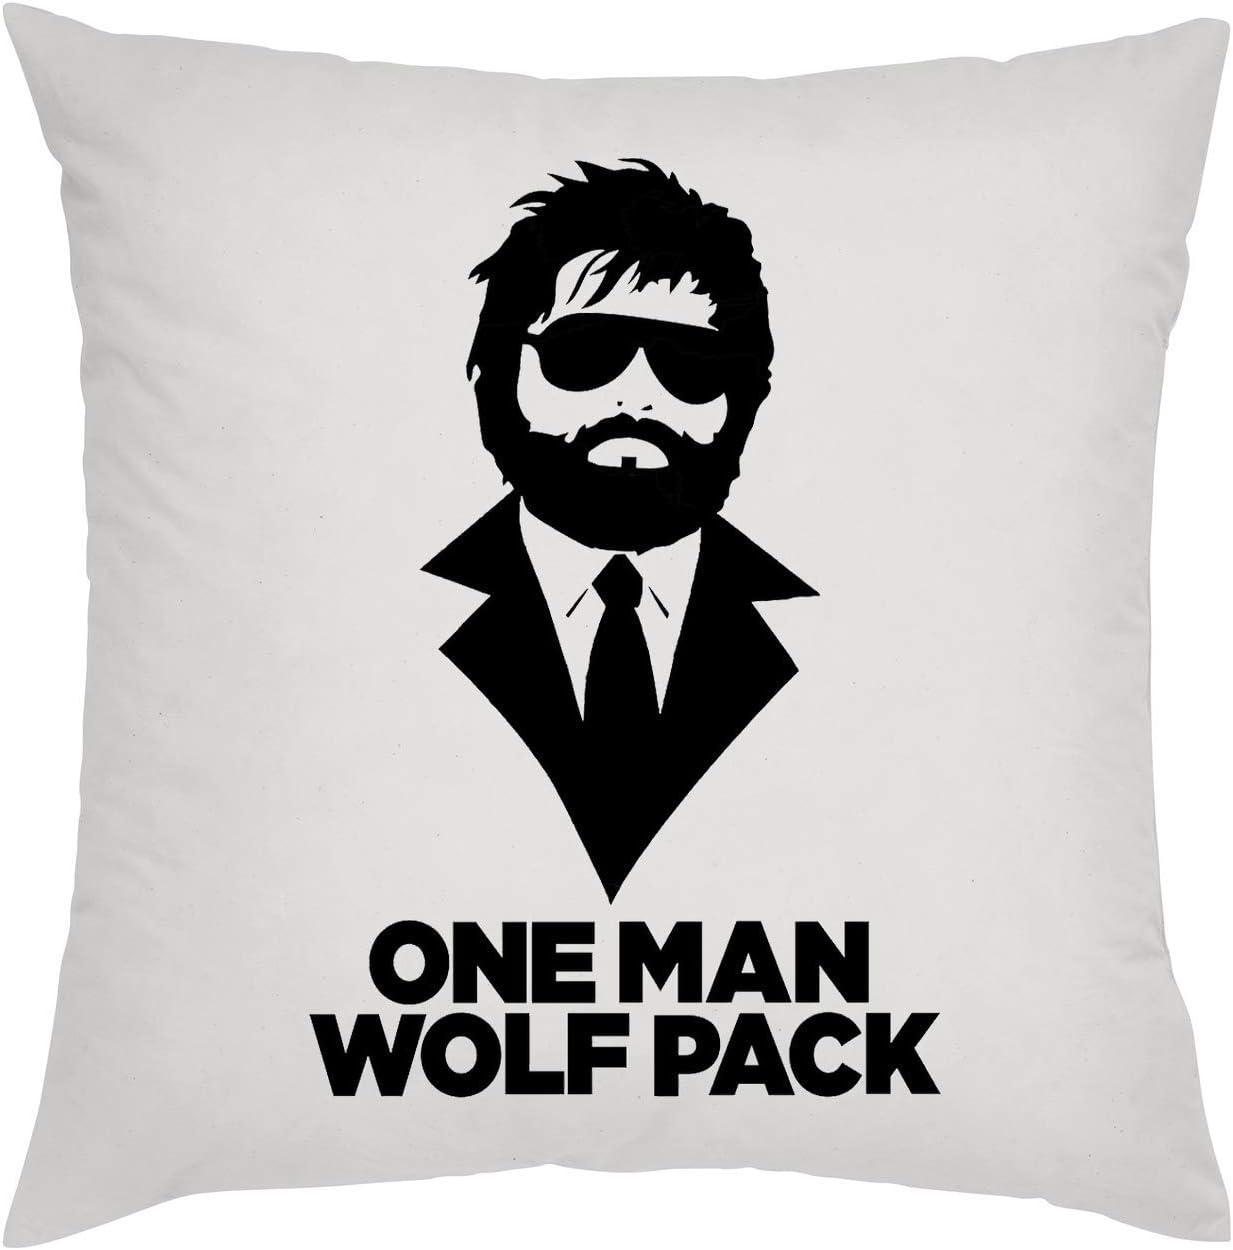 KRISSY One Man Wolf Pack Funny Almohada Pillow: Amazon.es: Hogar